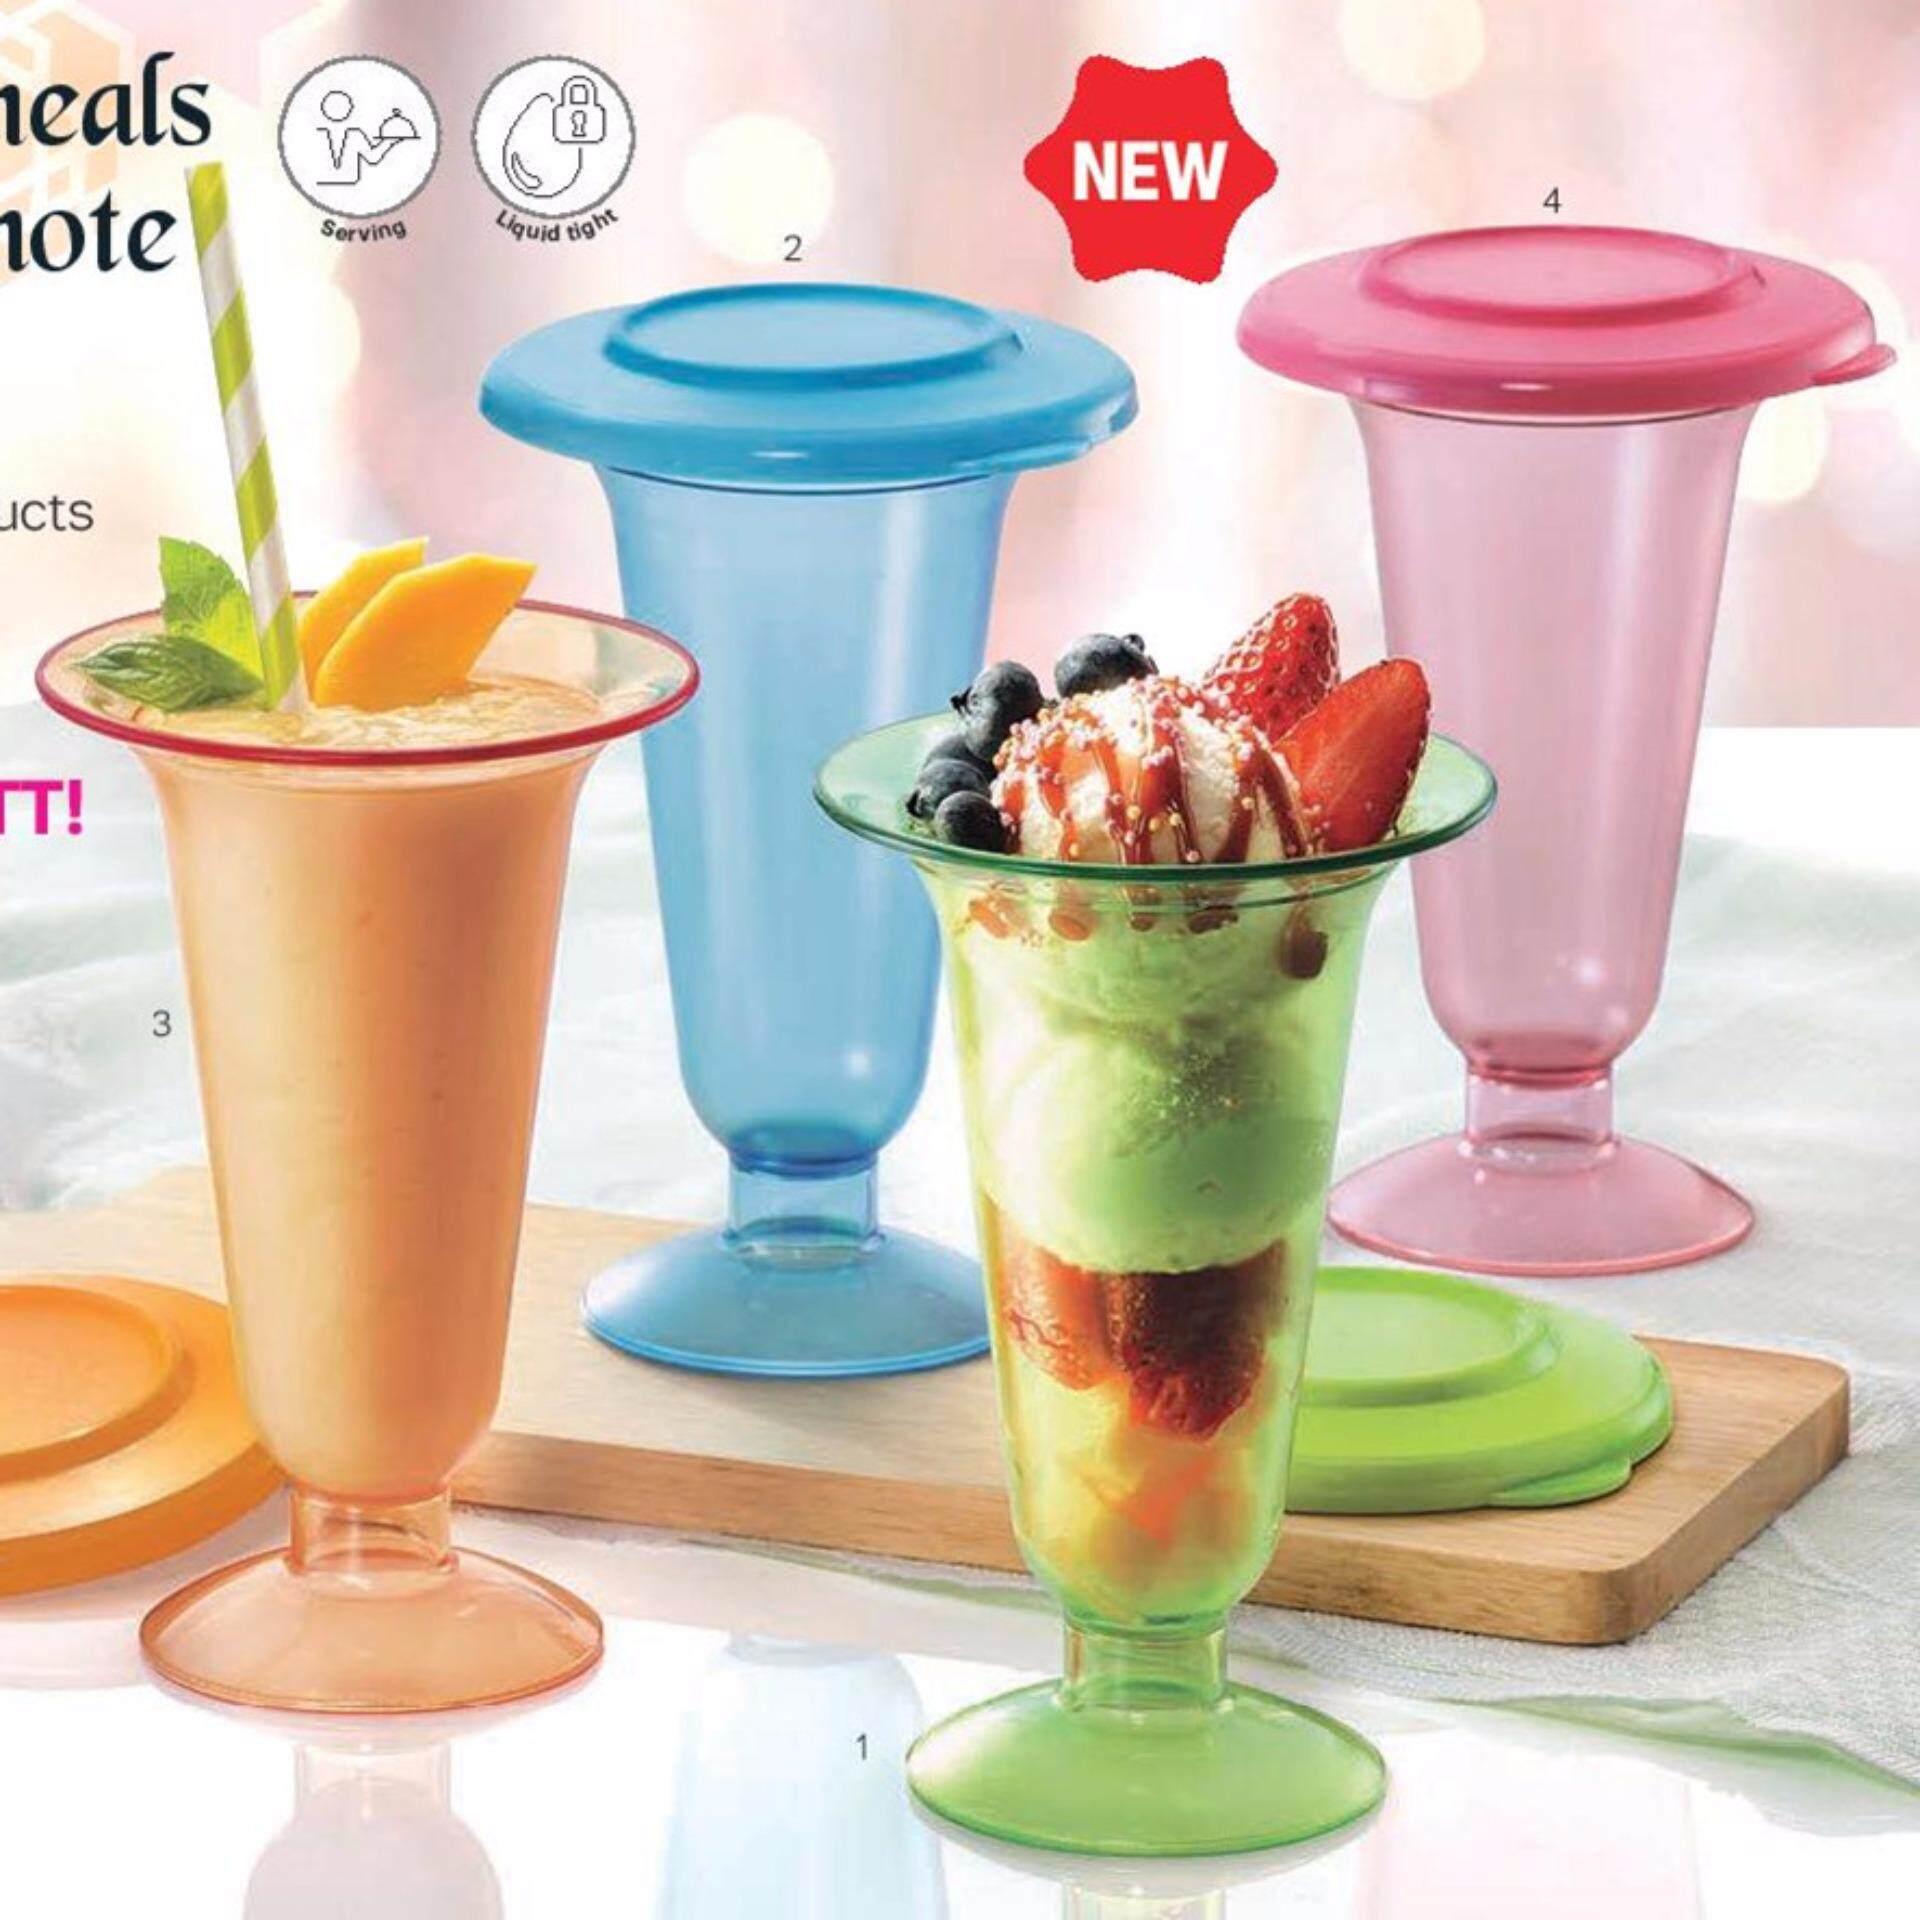 Tupperware TC Parfait Dish (1) 200ml - Random Color Send